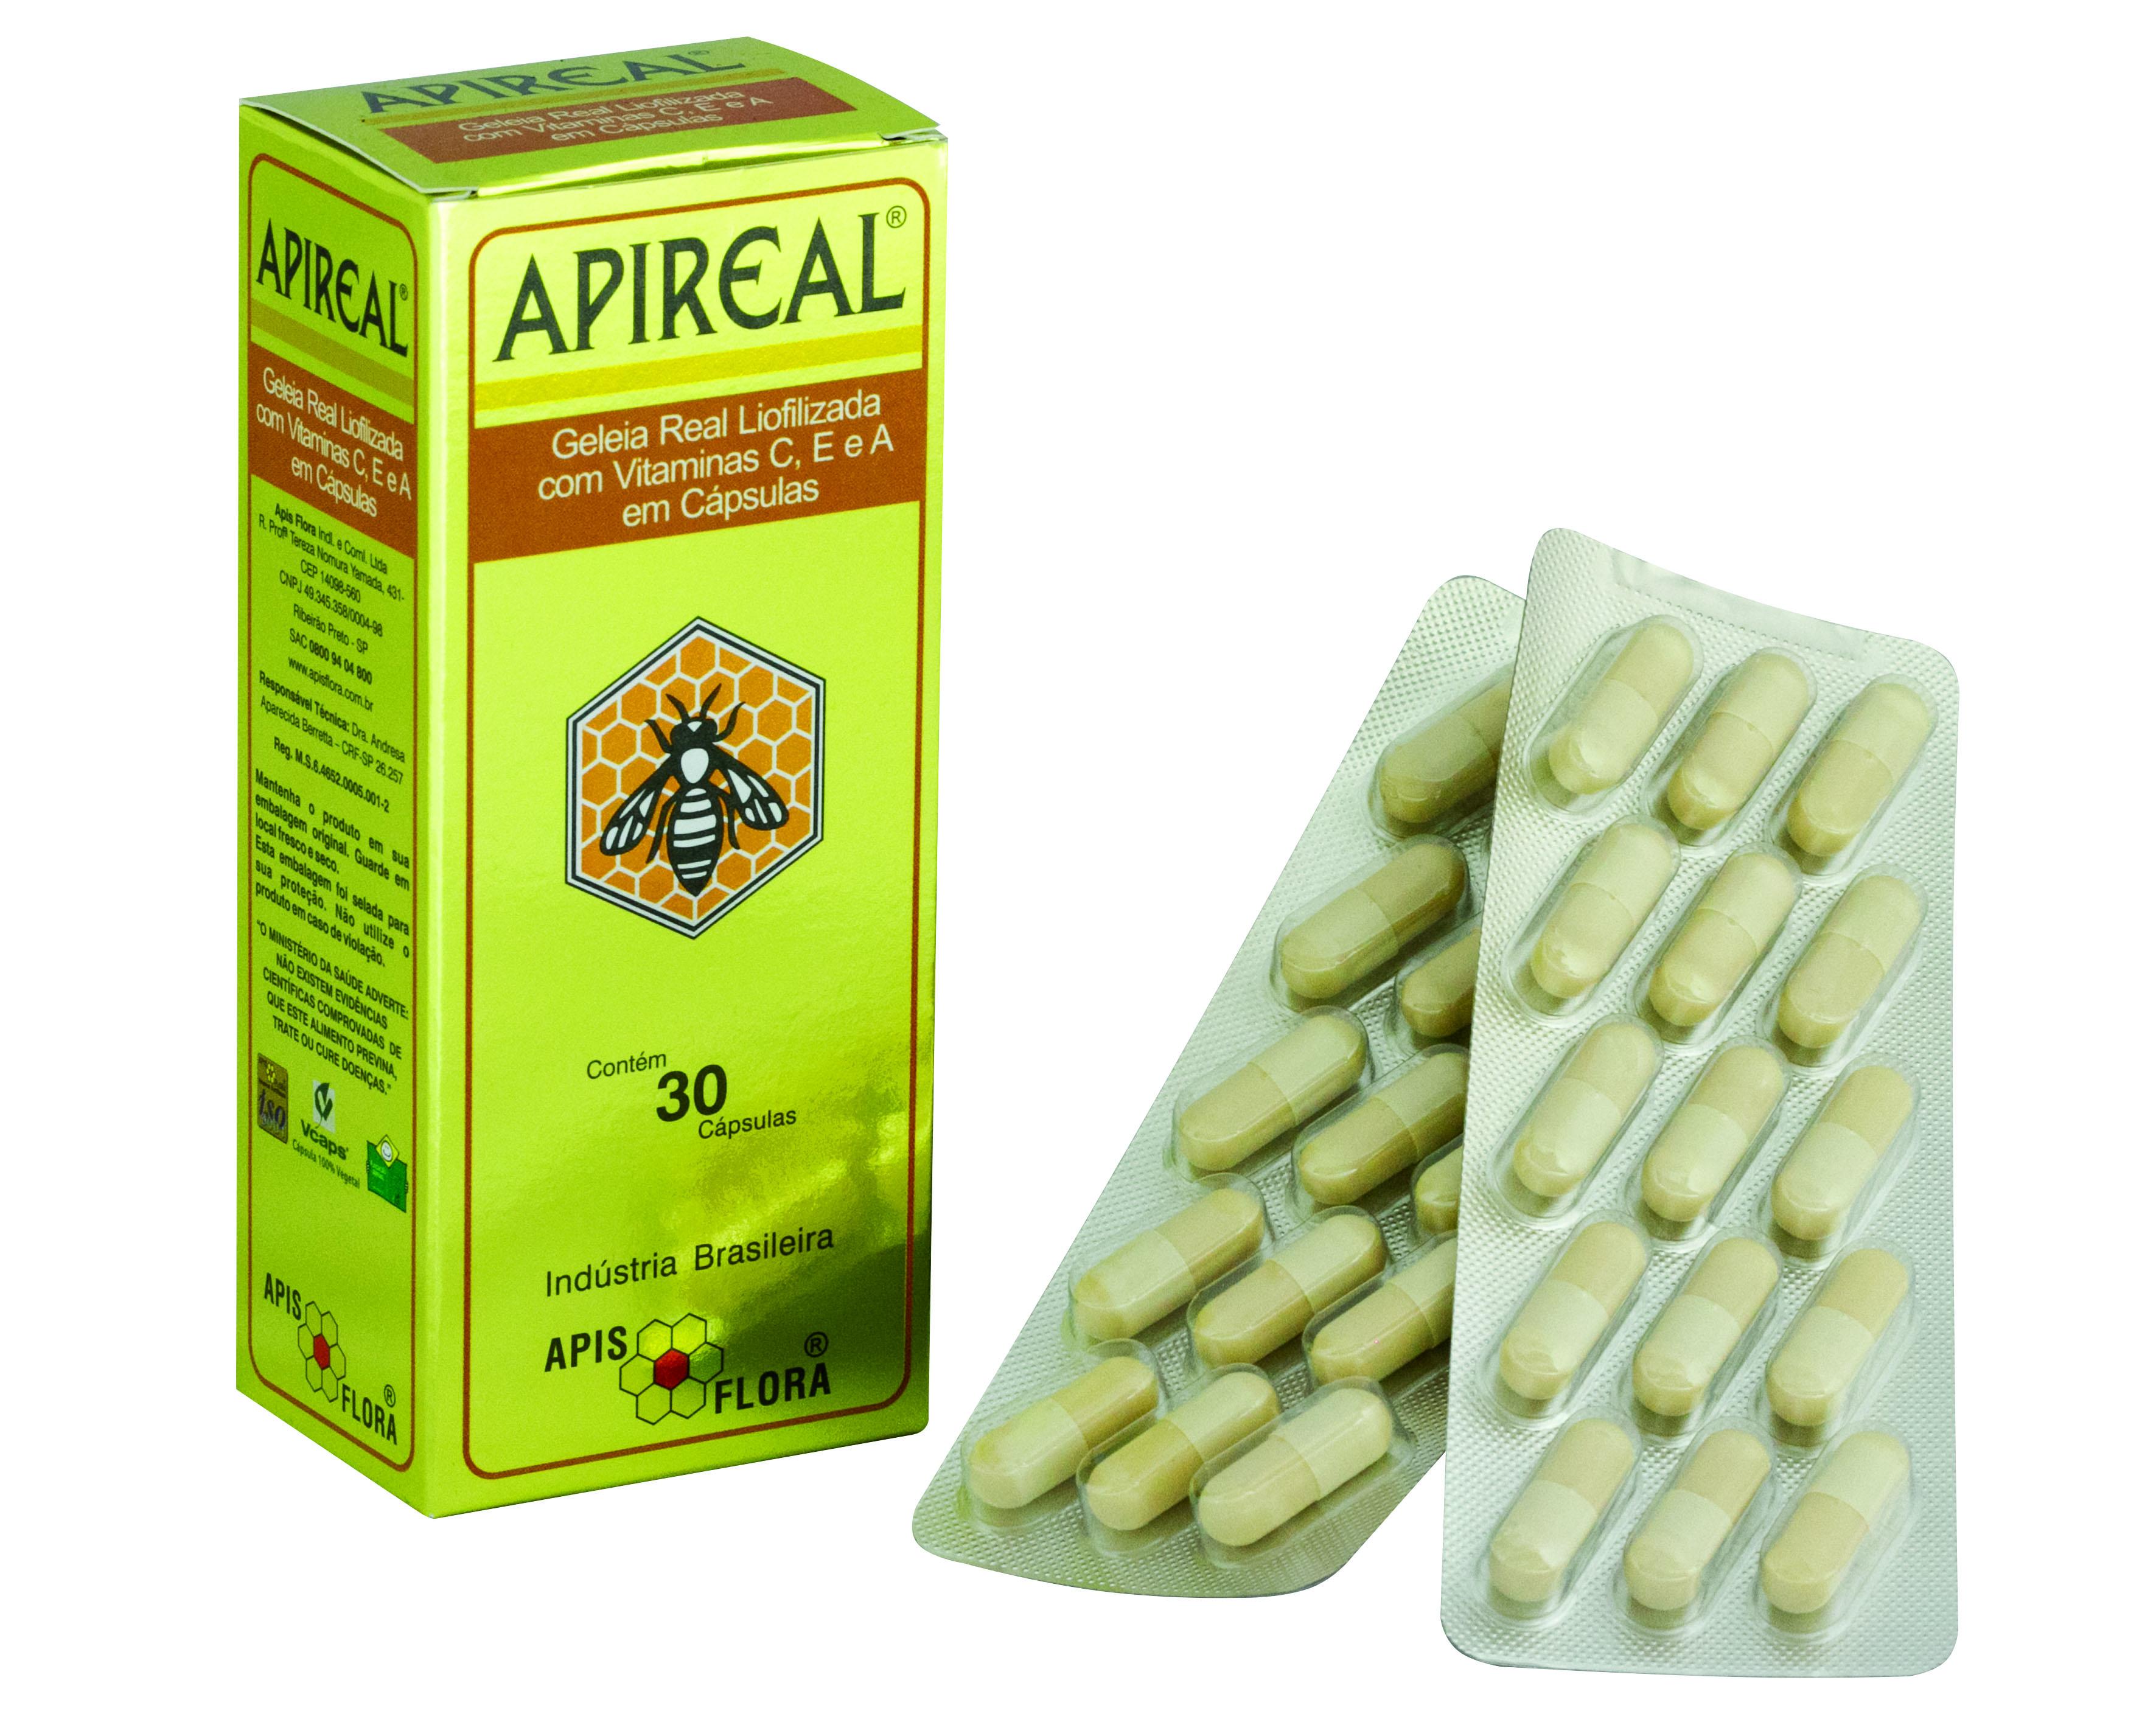 APIREAL GELEIA REAL EM CAPSULA